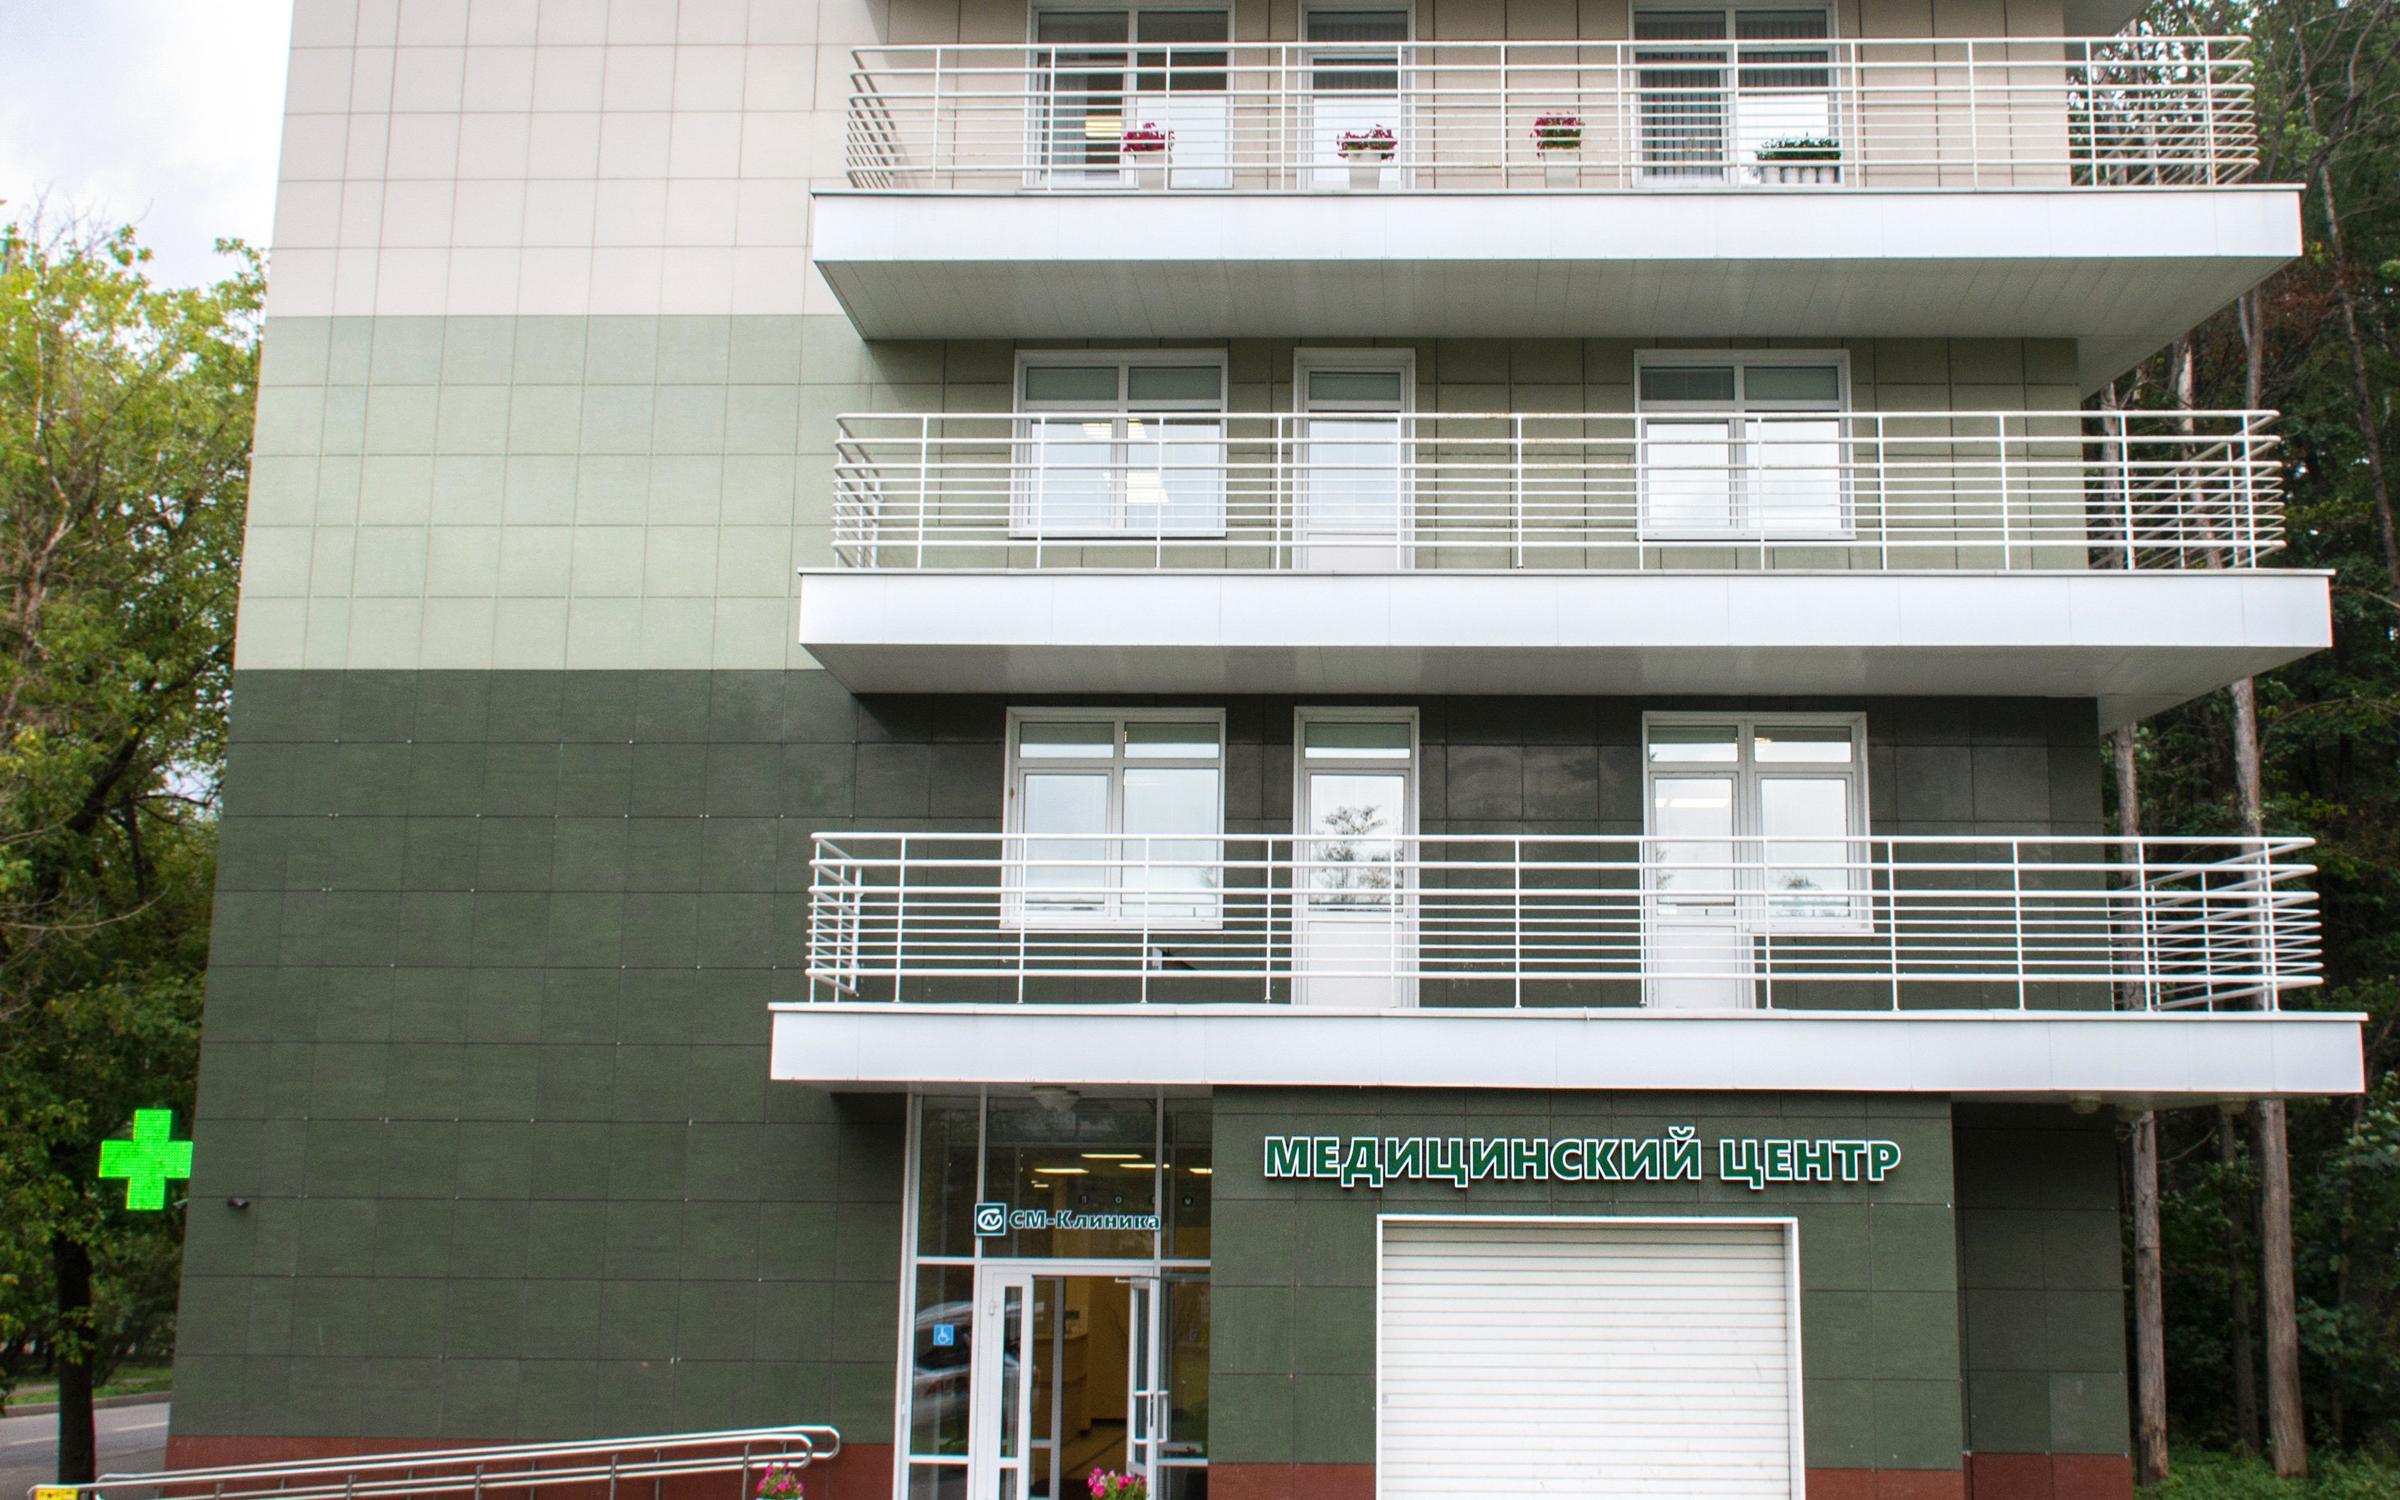 фотография Медицинского центра СМ-Клиника на улице Маршала Тимошенко